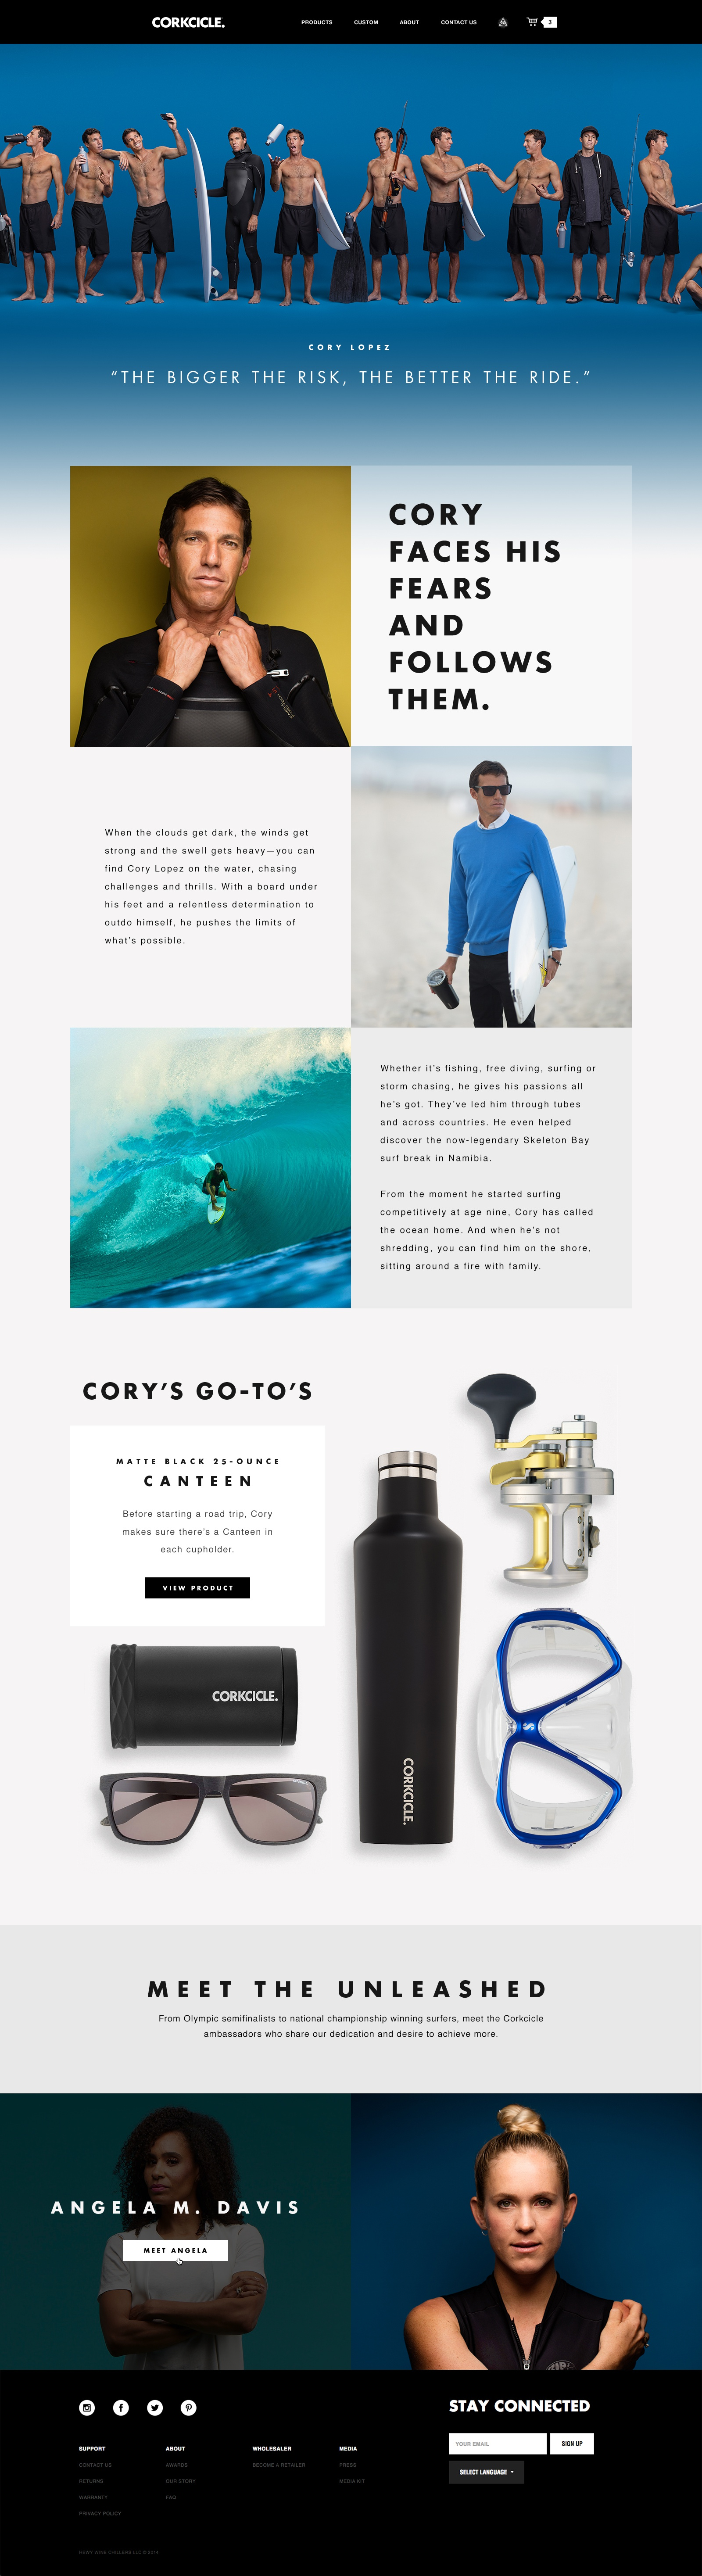 Corkcicle ambassador cory